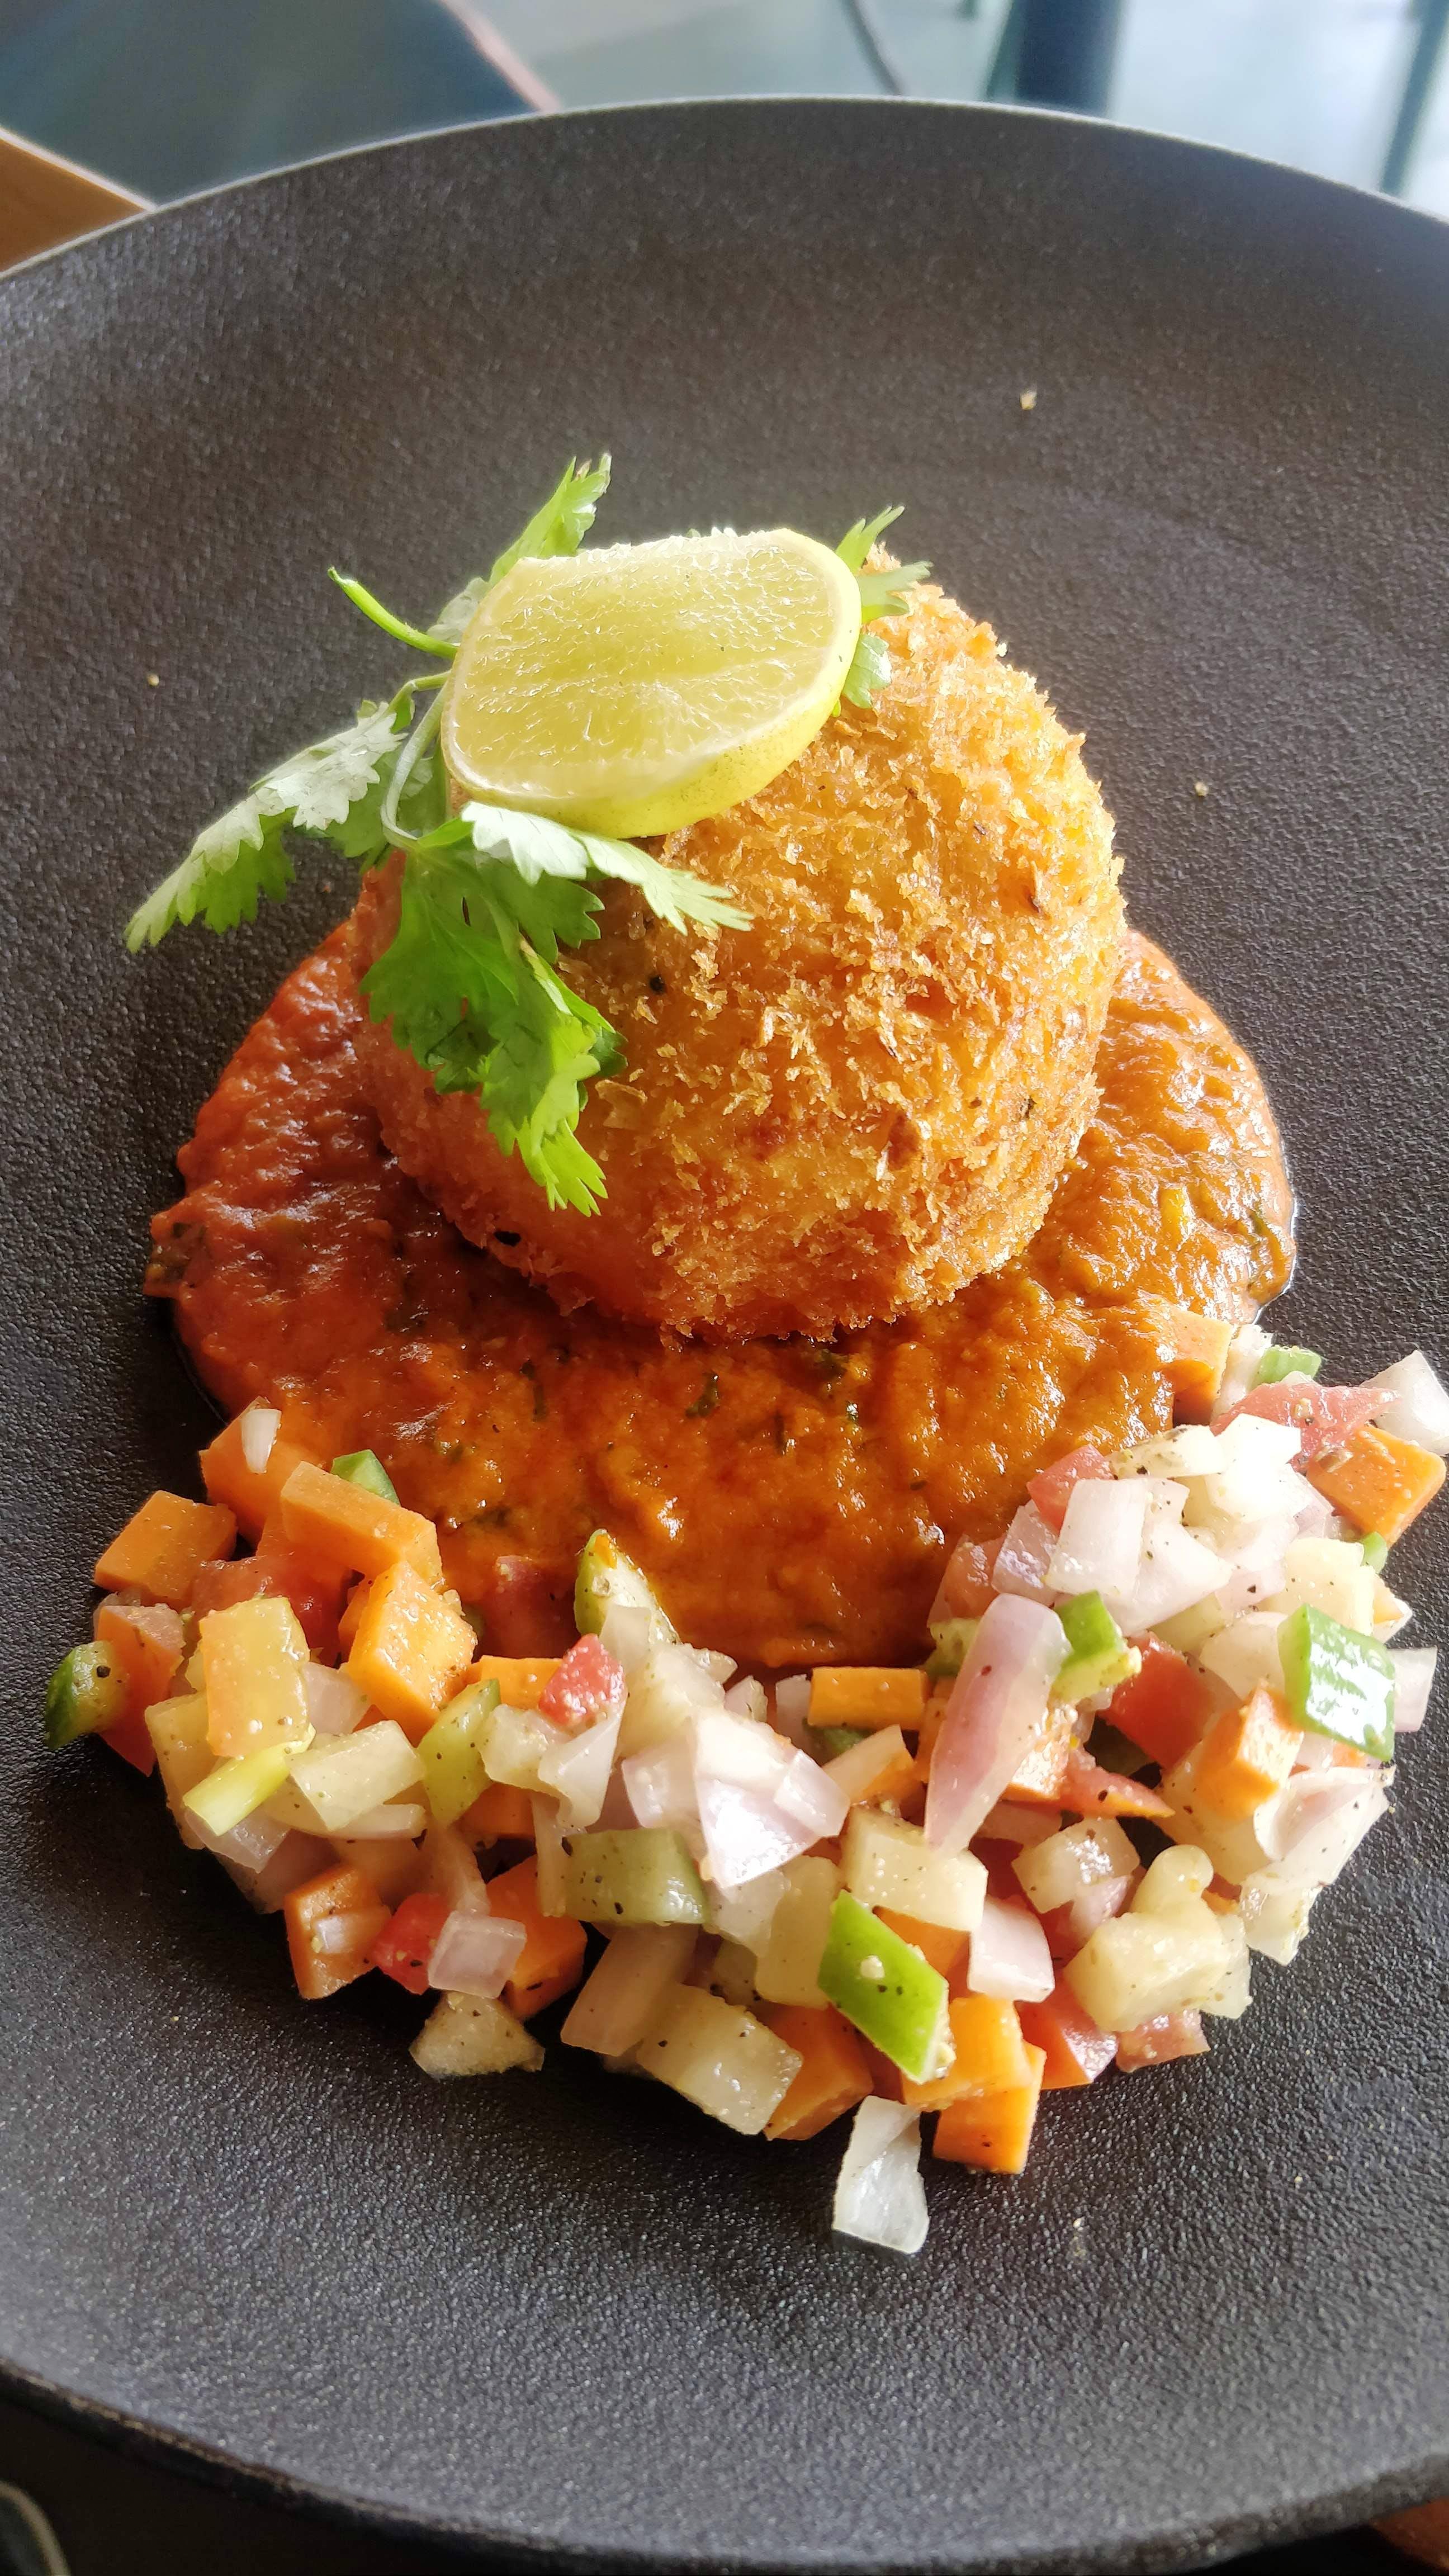 Dish,Food,Cuisine,Ingredient,Produce,Meat,Staple food,Recipe,Fried food,Garnish